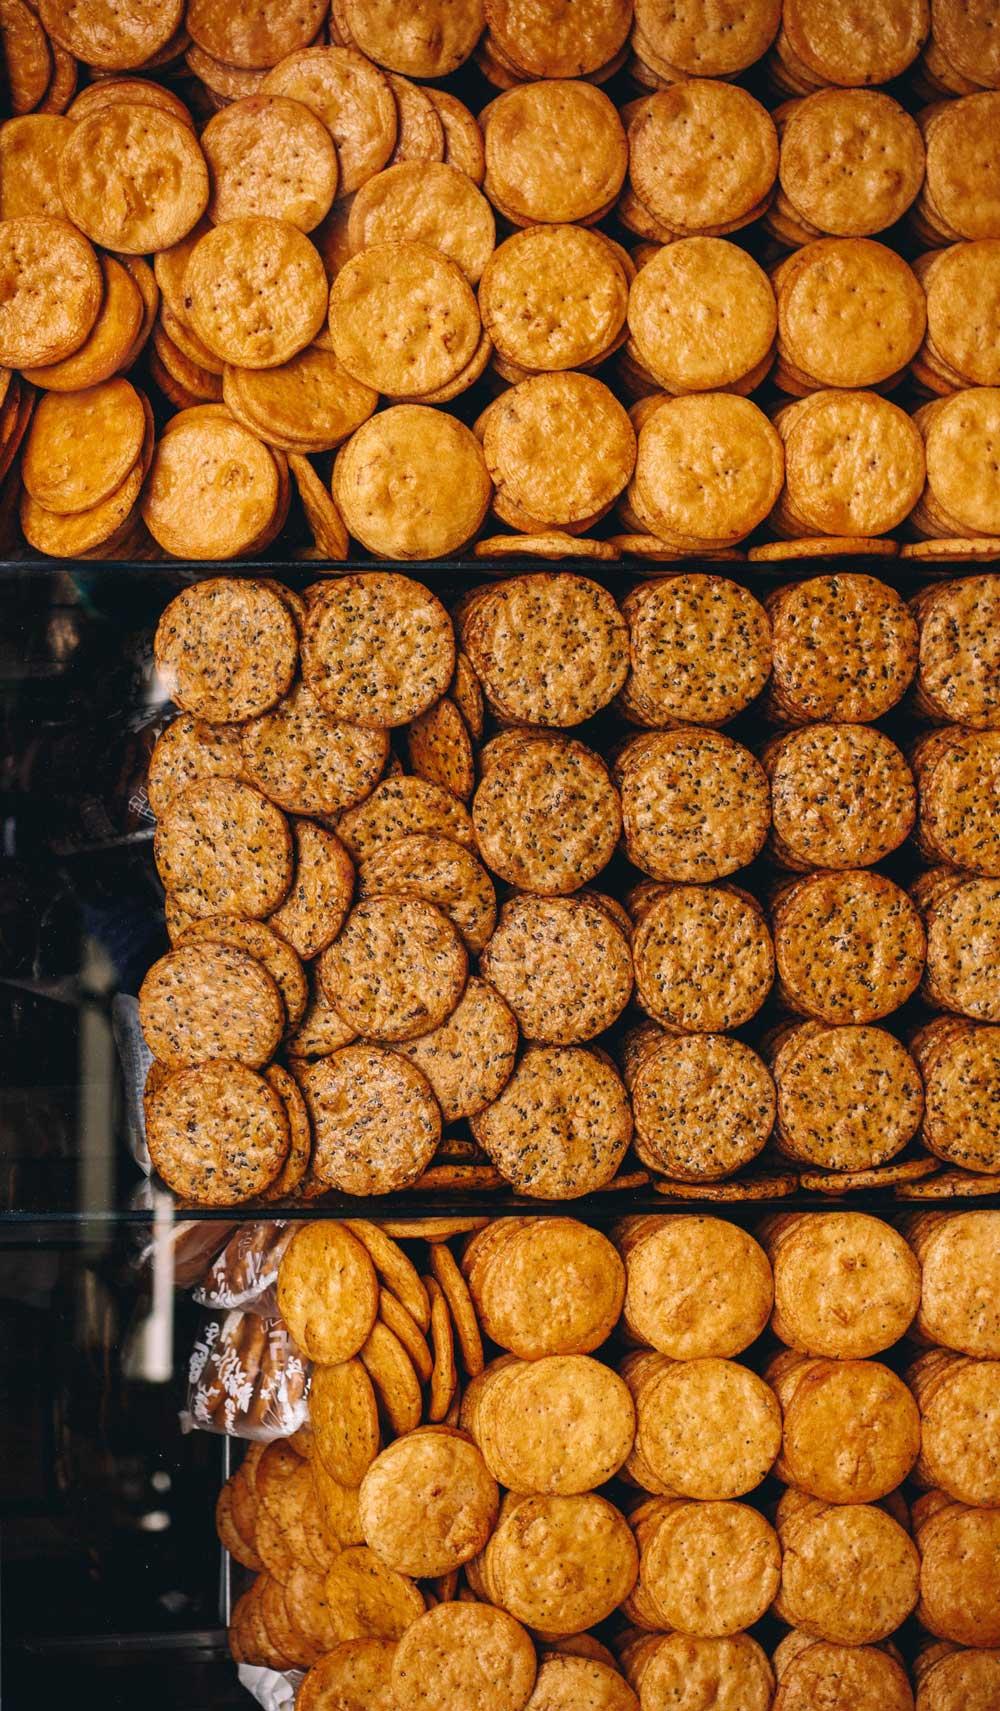 Thermomix Savoury Baking